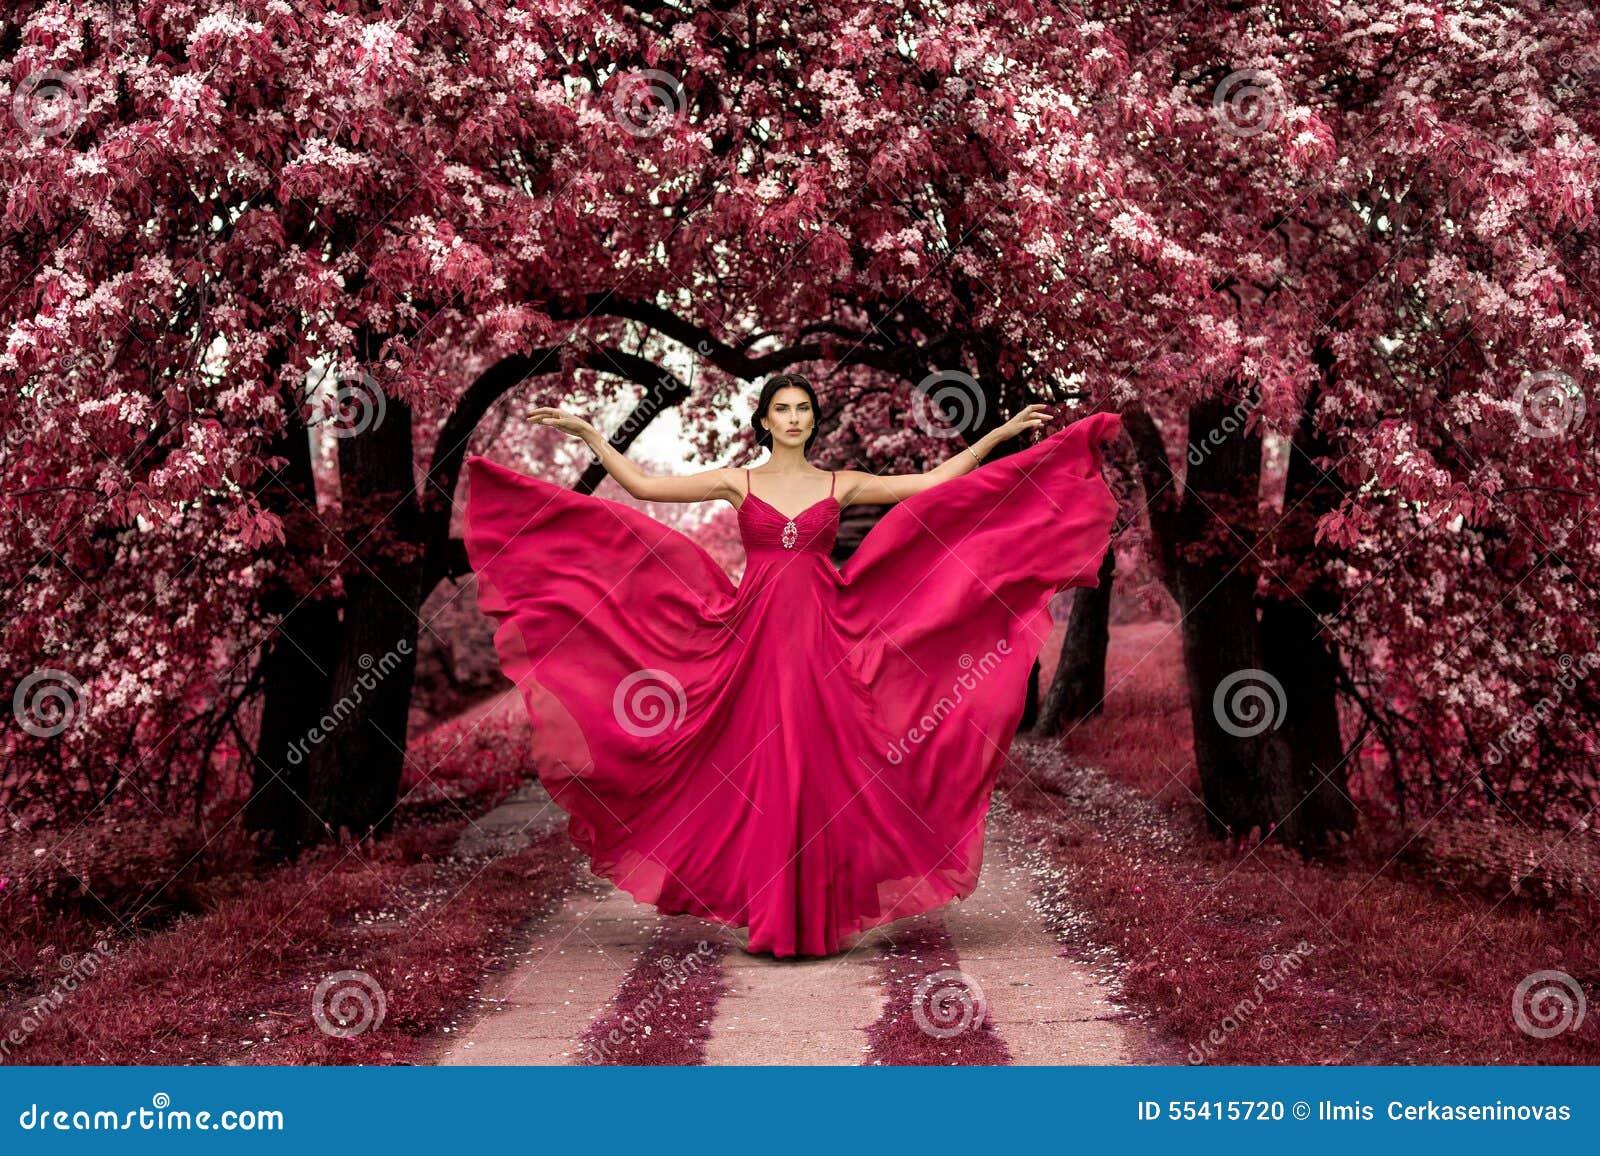 Maleficent Pink Princess, woman with beautiful dress